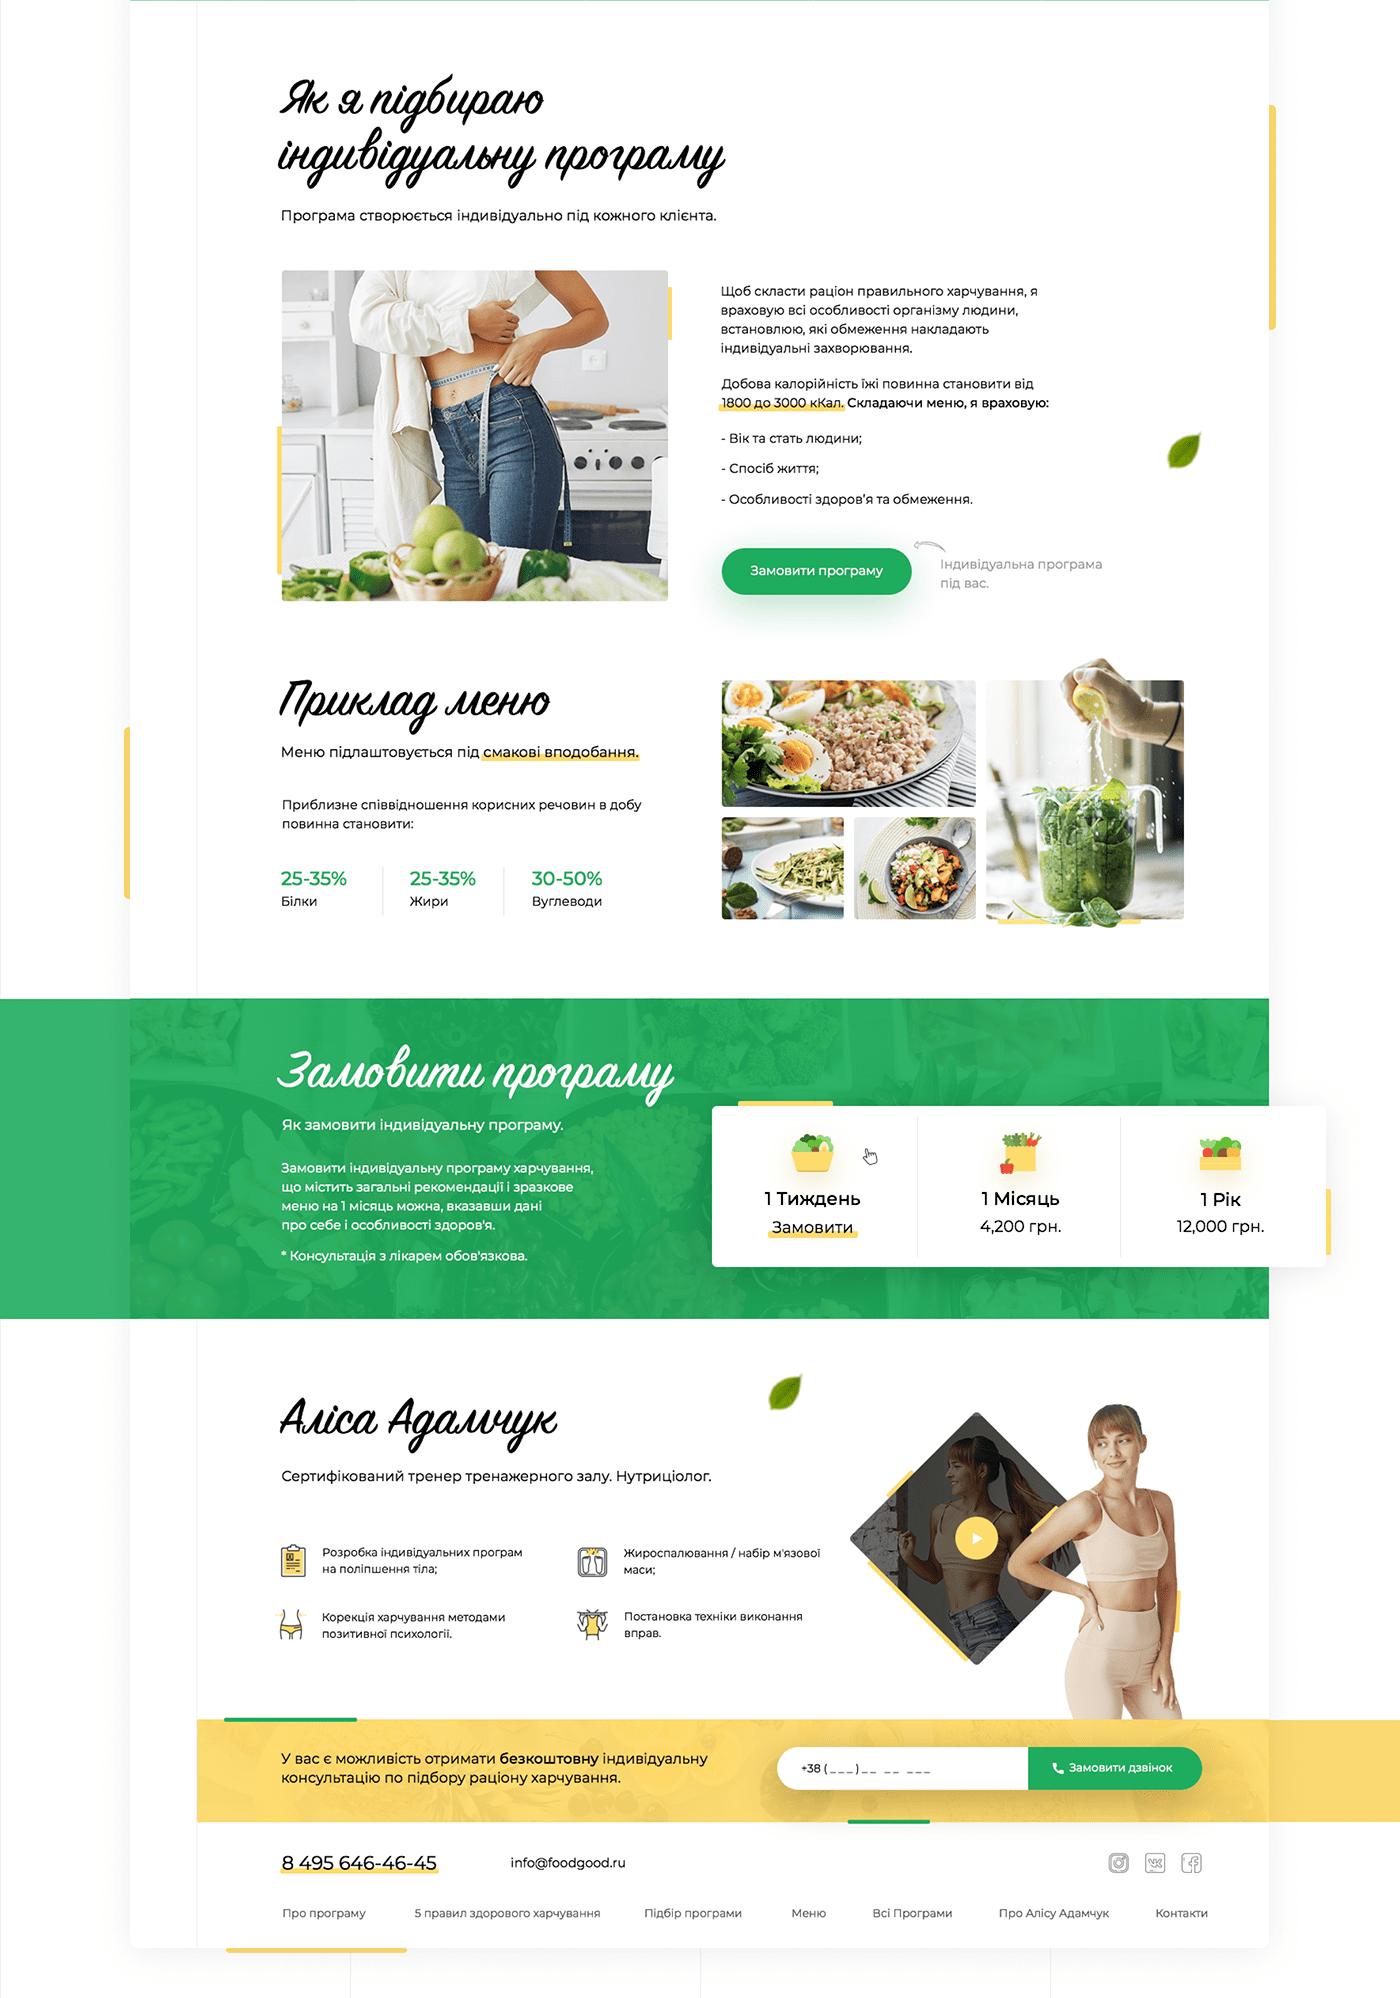 avocado Figma Food  healty modern sport trainer user expirience user interface здоровя